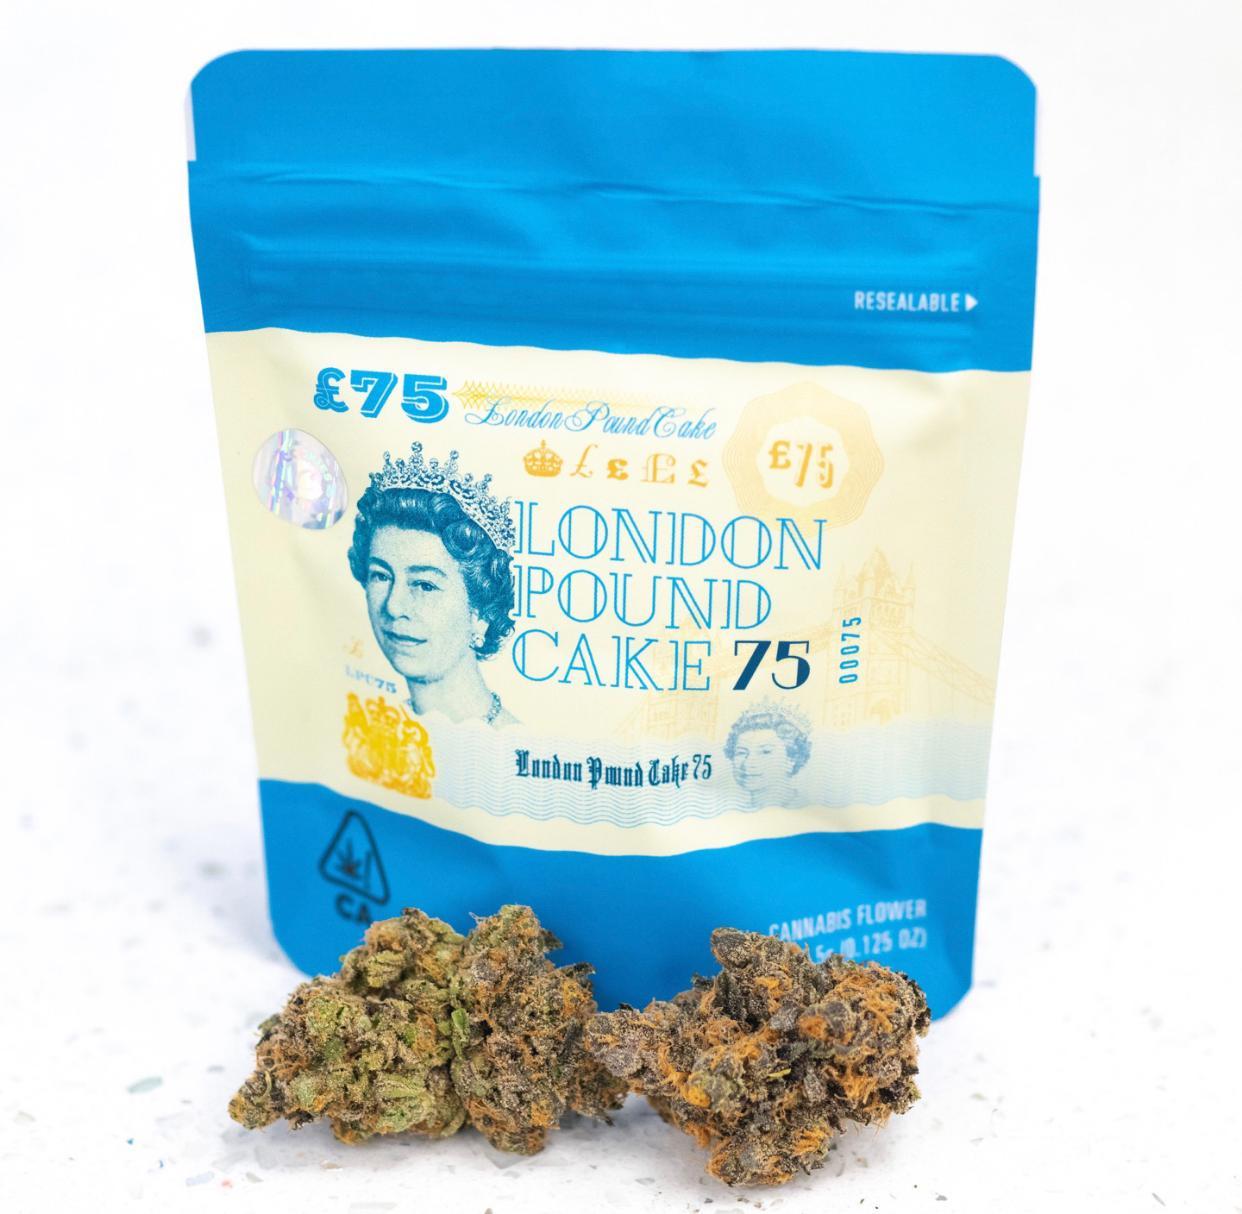 London pound cake cookies strain